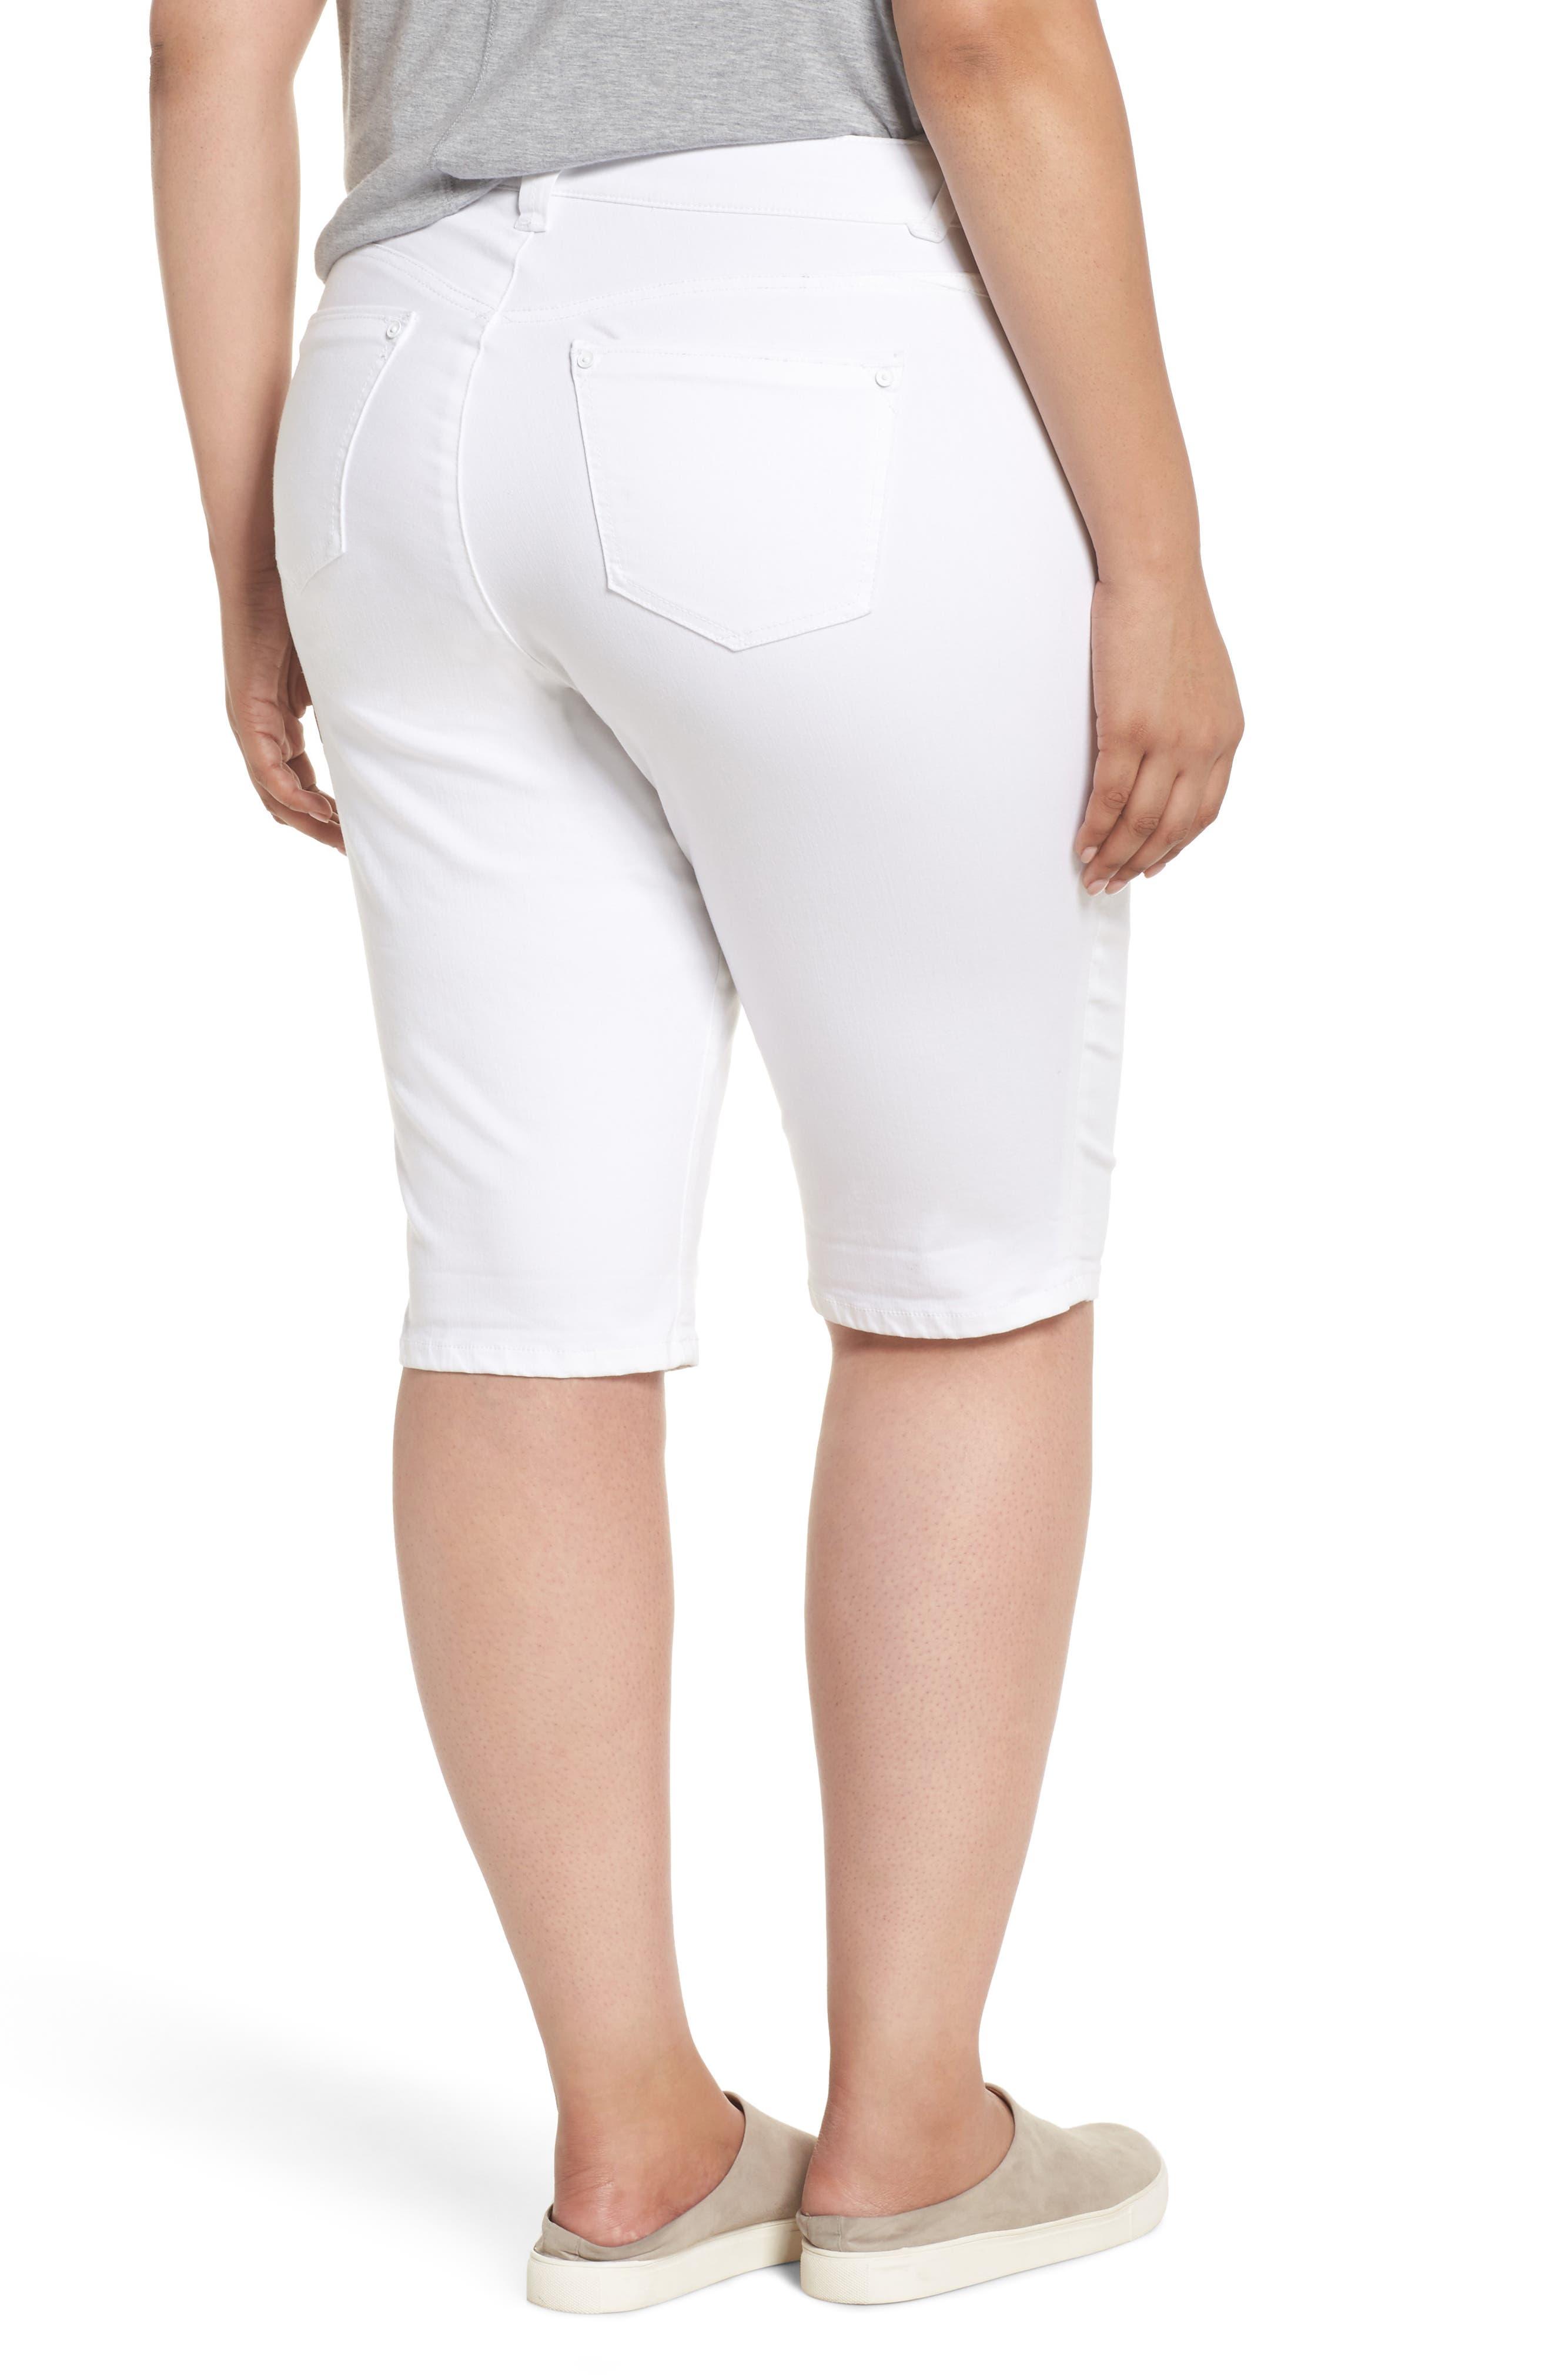 Ab-solution Bermuda Shorts,                             Alternate thumbnail 2, color,                             Optic White